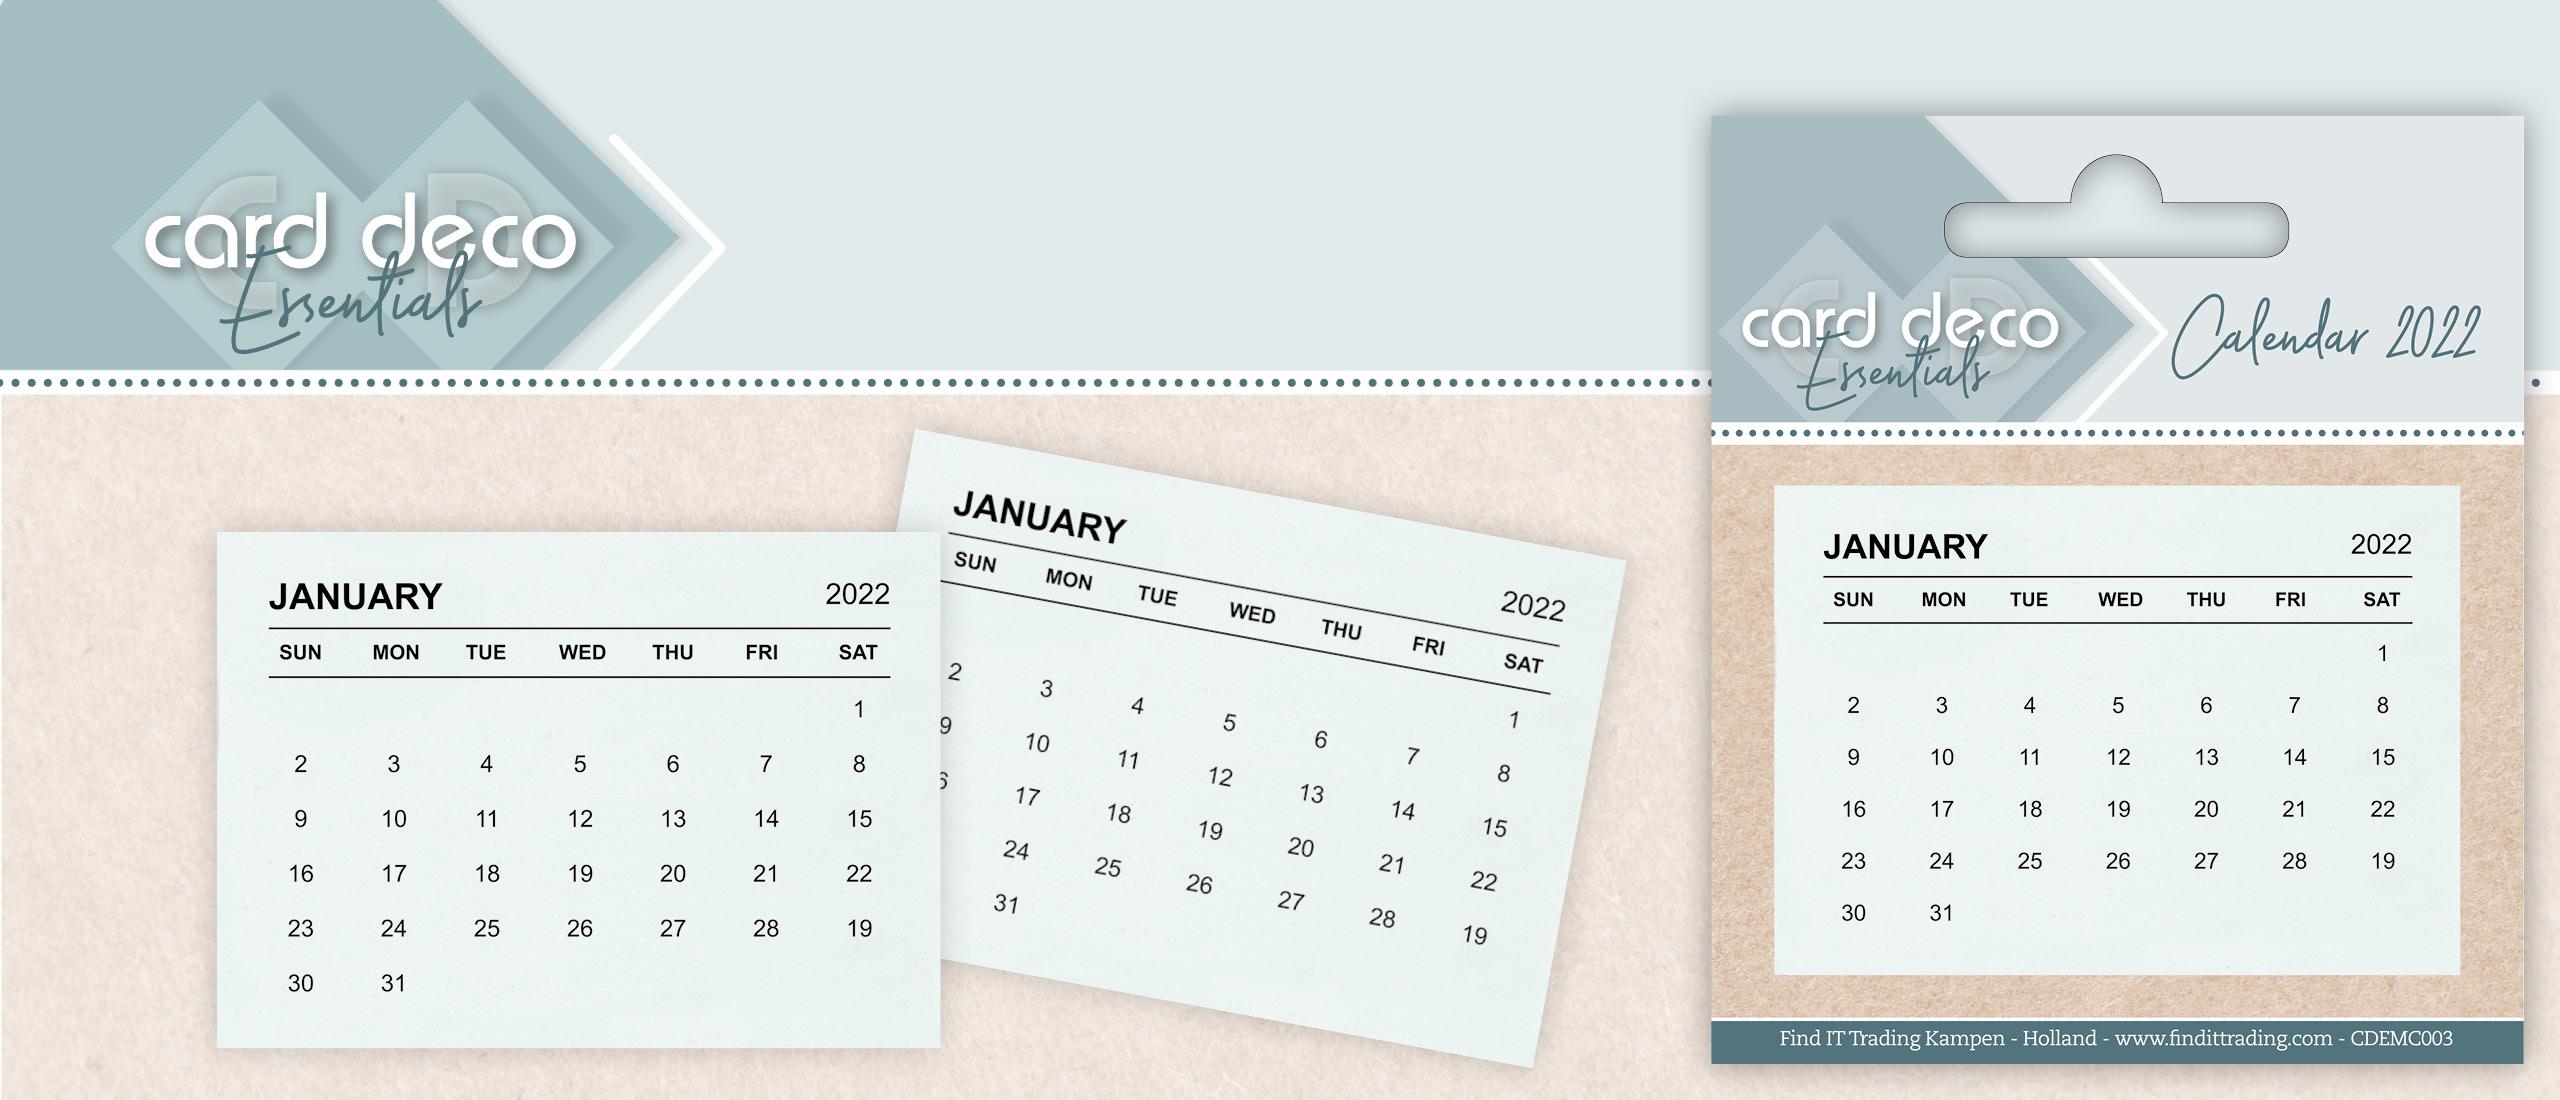 Calendar Tabs - Card Deco Essentials